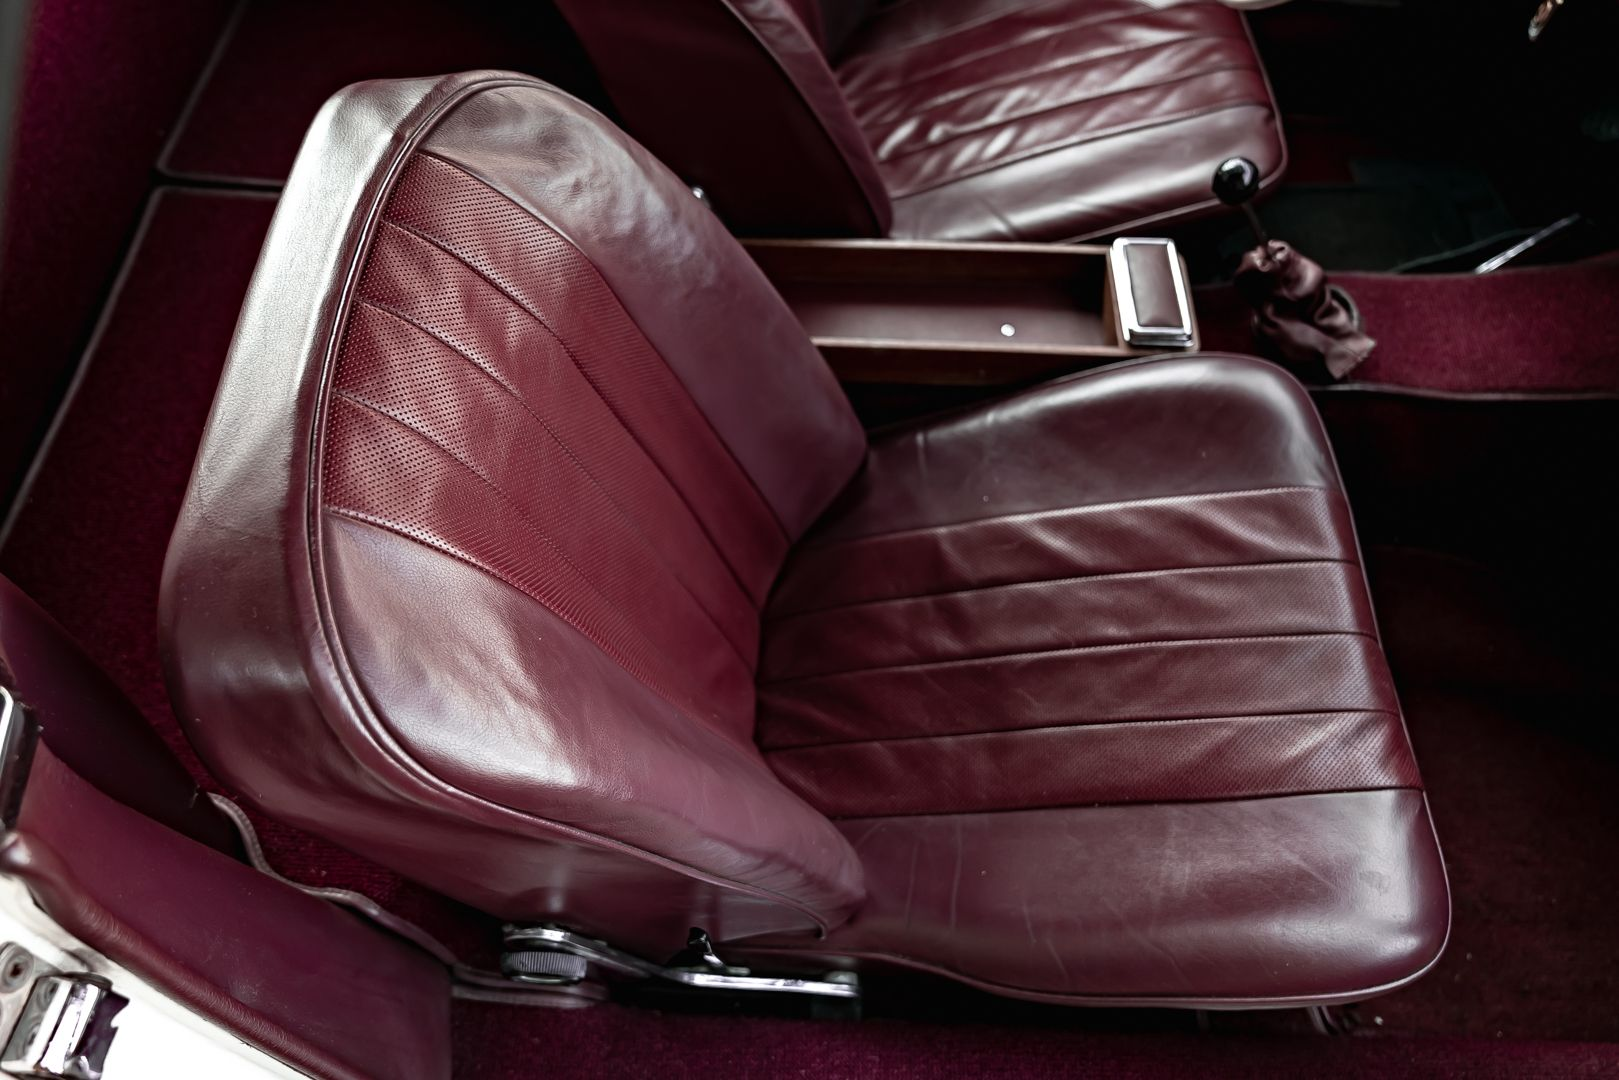 1965 Mercedes-Benz SL230 Pagoda 78537